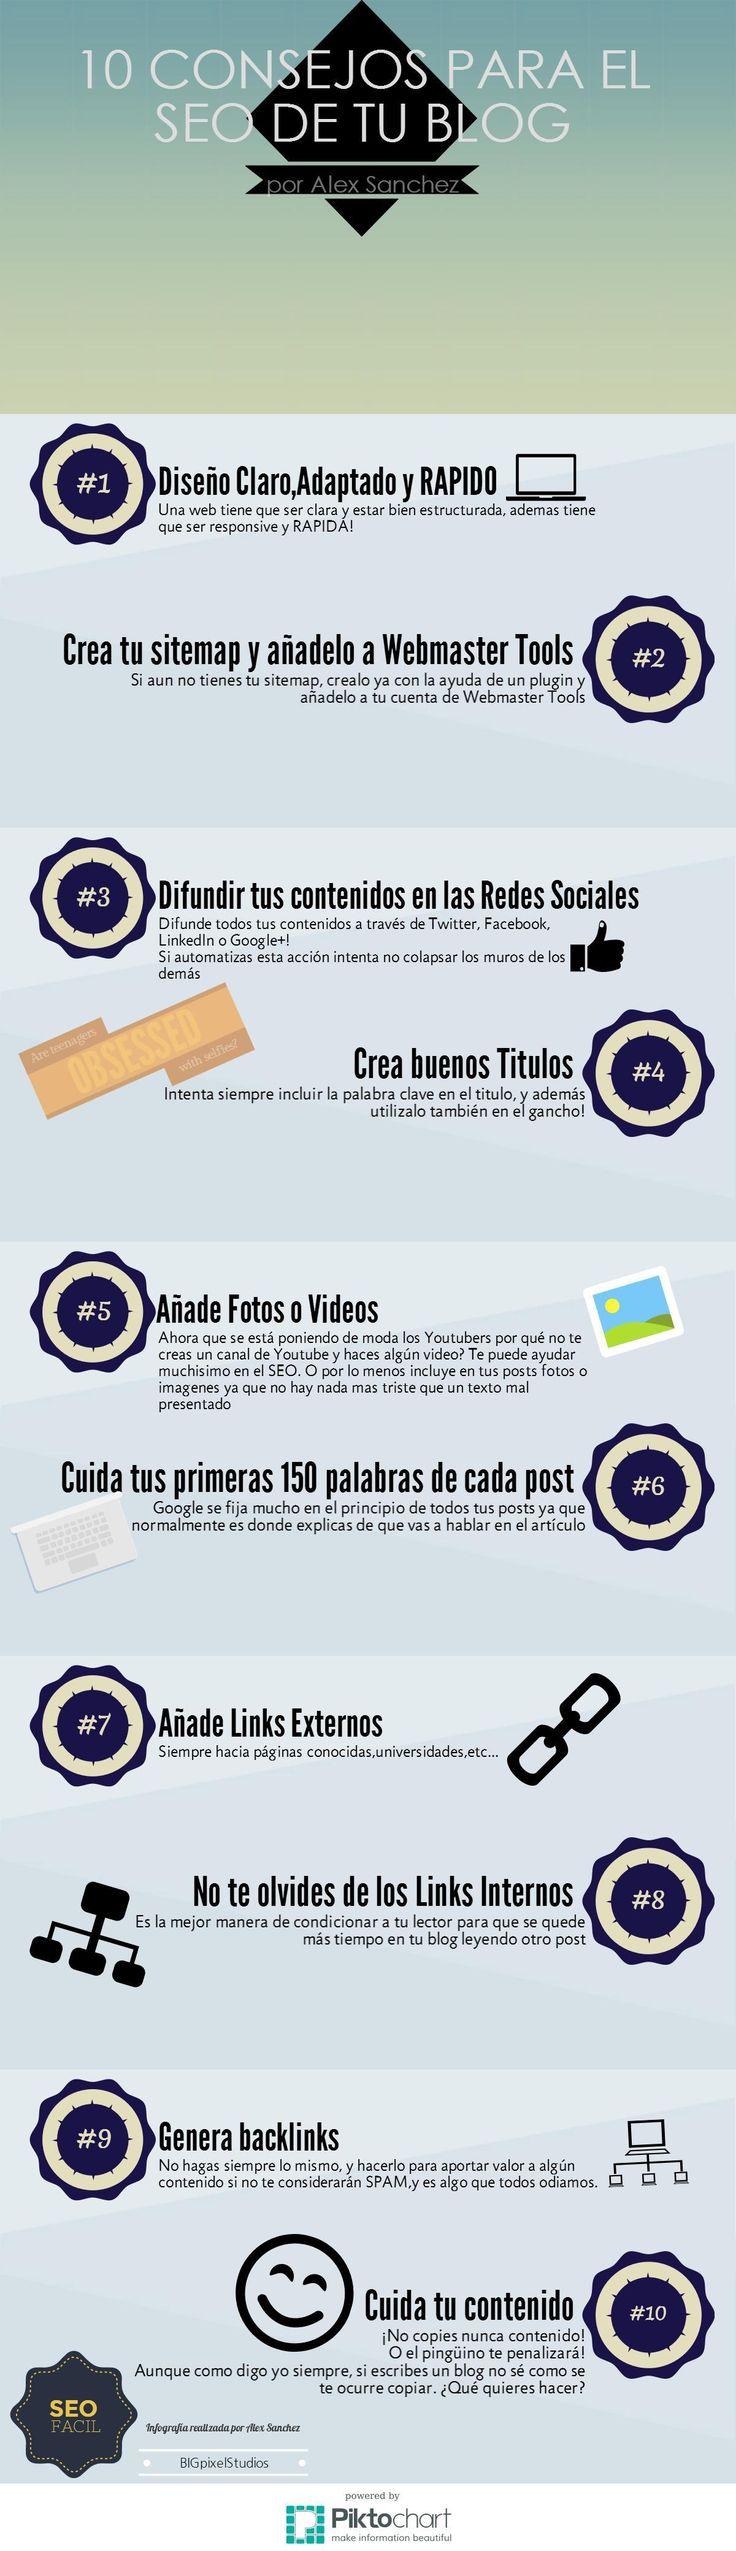 10 consejos para el SEO de tu Blog #infografia